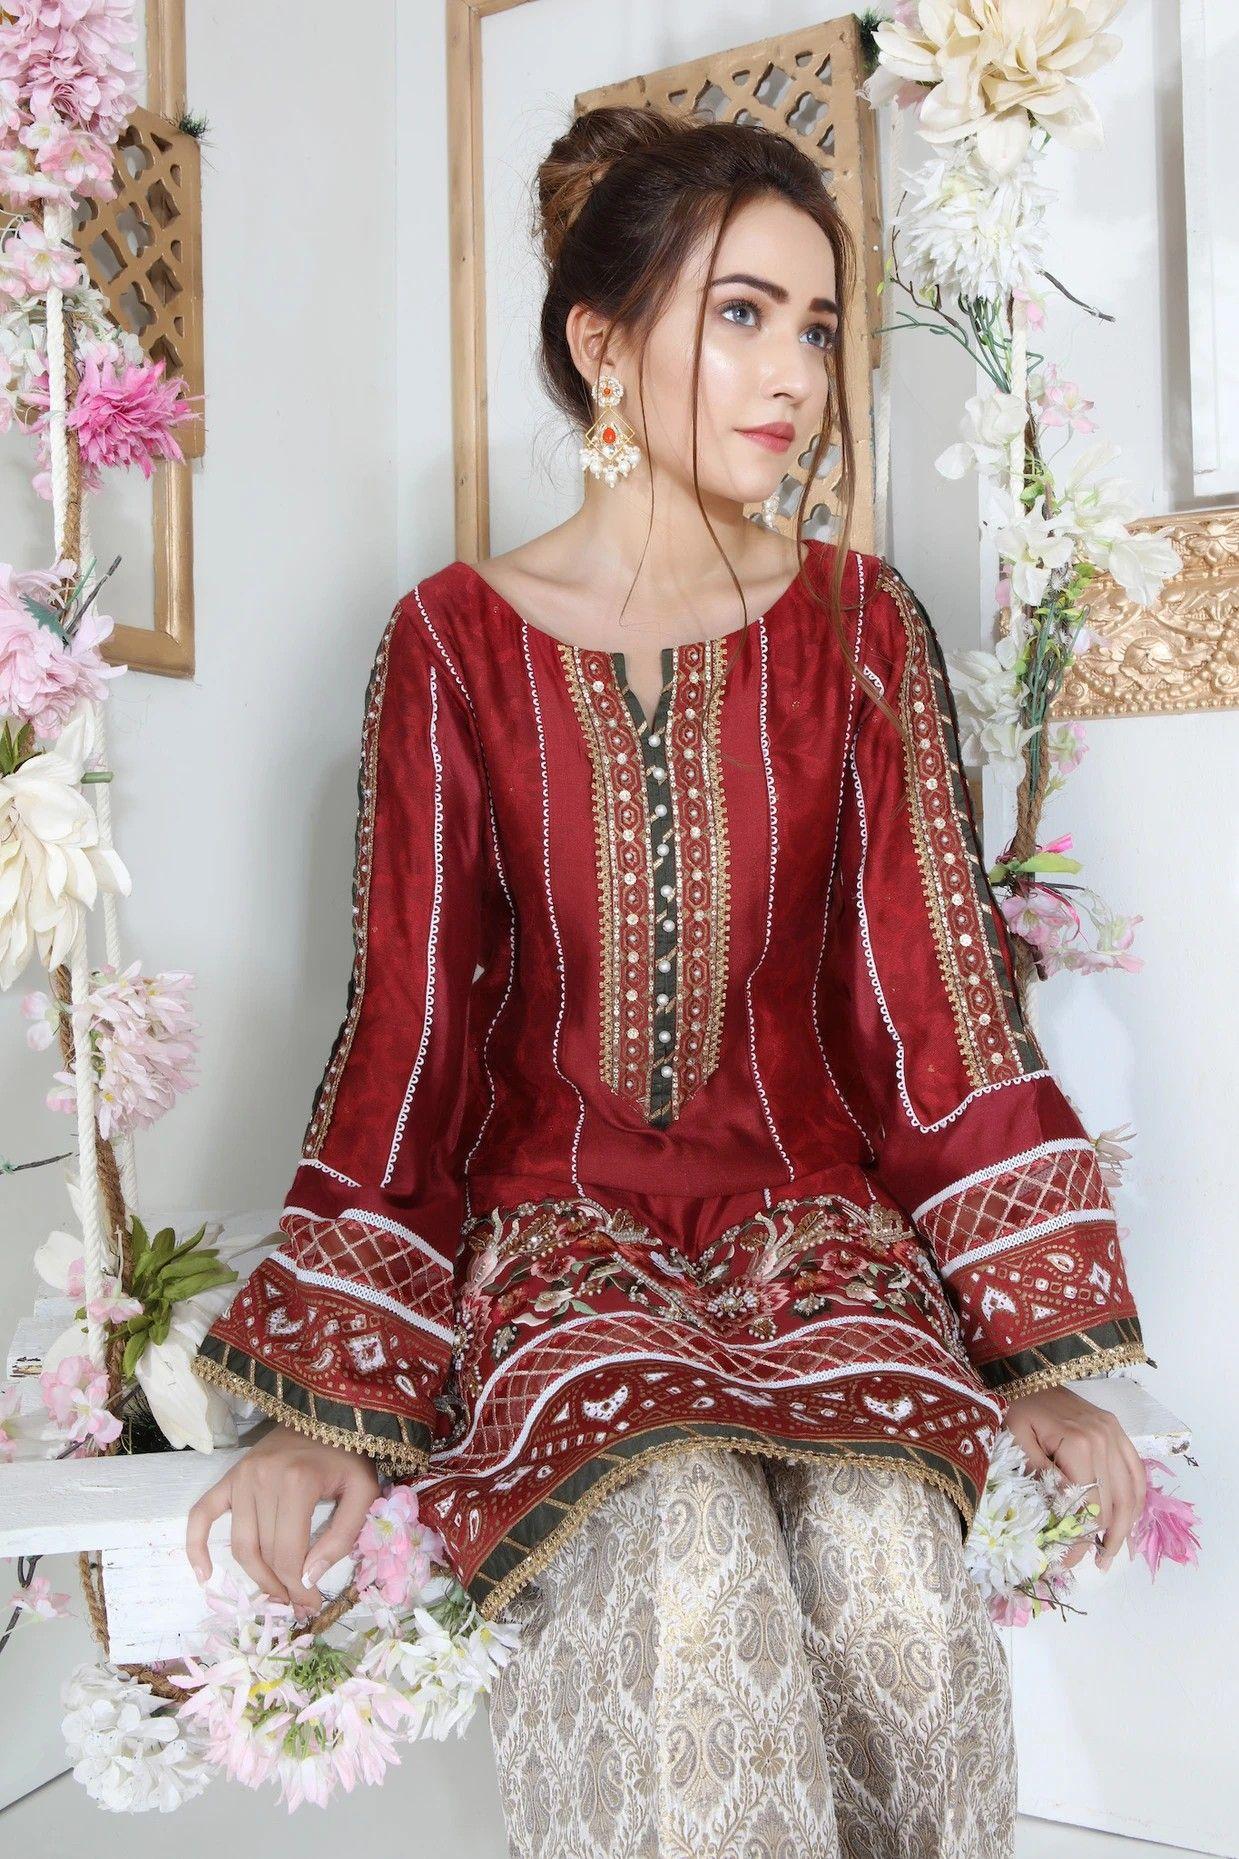 Pin By Venisa Misquitta On Salwar Designs In 2020 Pakistani Dress Design Designer Party Wear Dresses Wedding Dresses For Girls,Wedding Guest Simple Rose Gold Casual Dress